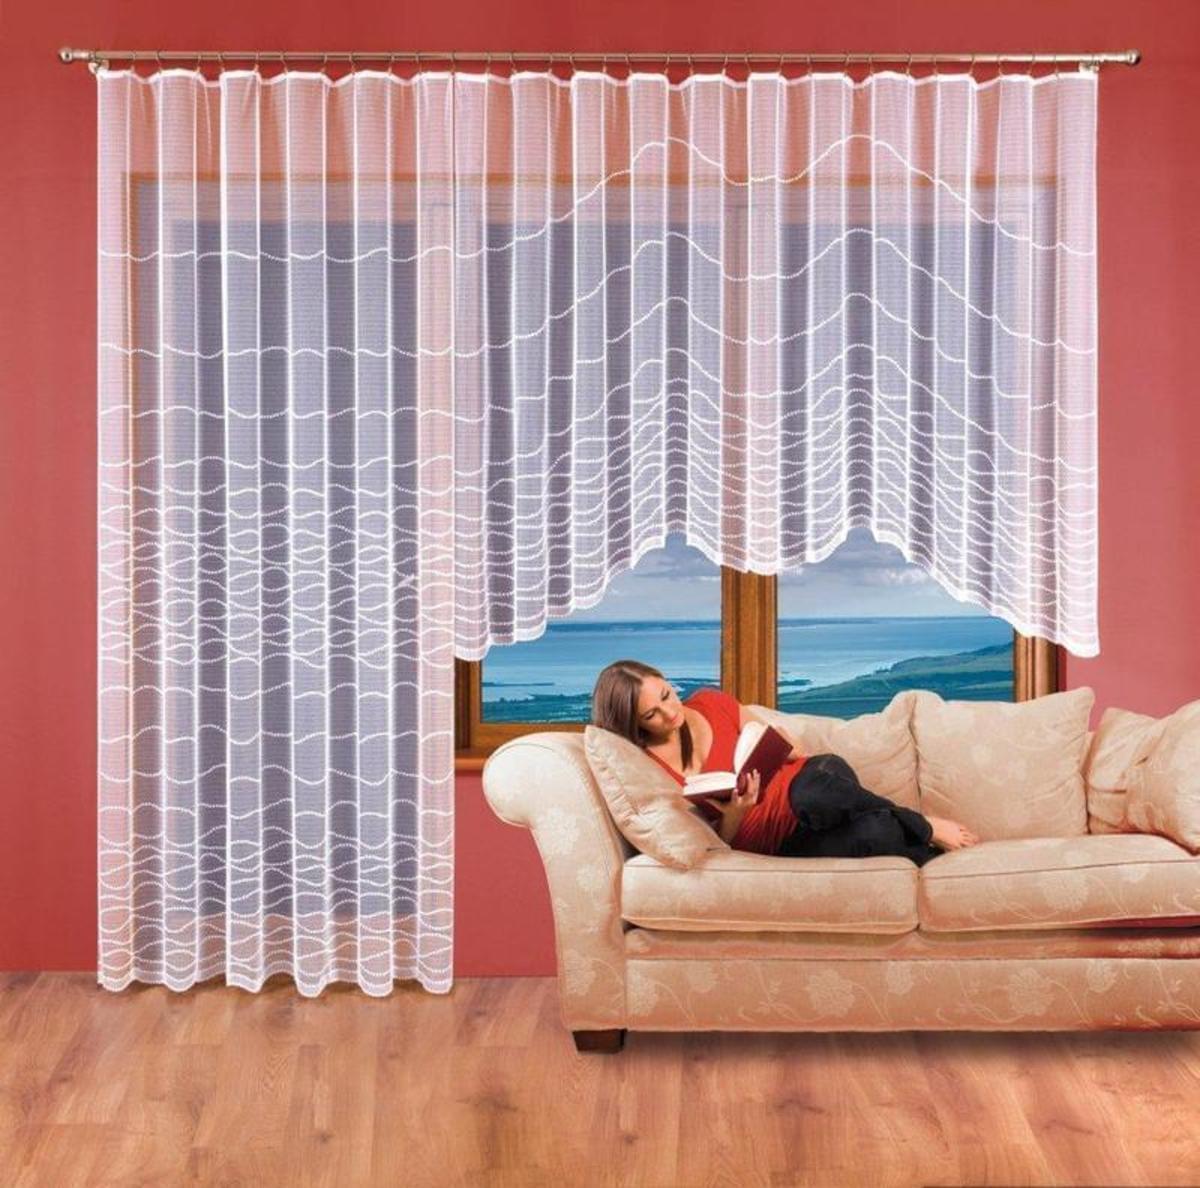 Forbyt Hotová záclona, Aneta 350 x 160 cm + 200 x 250 cm